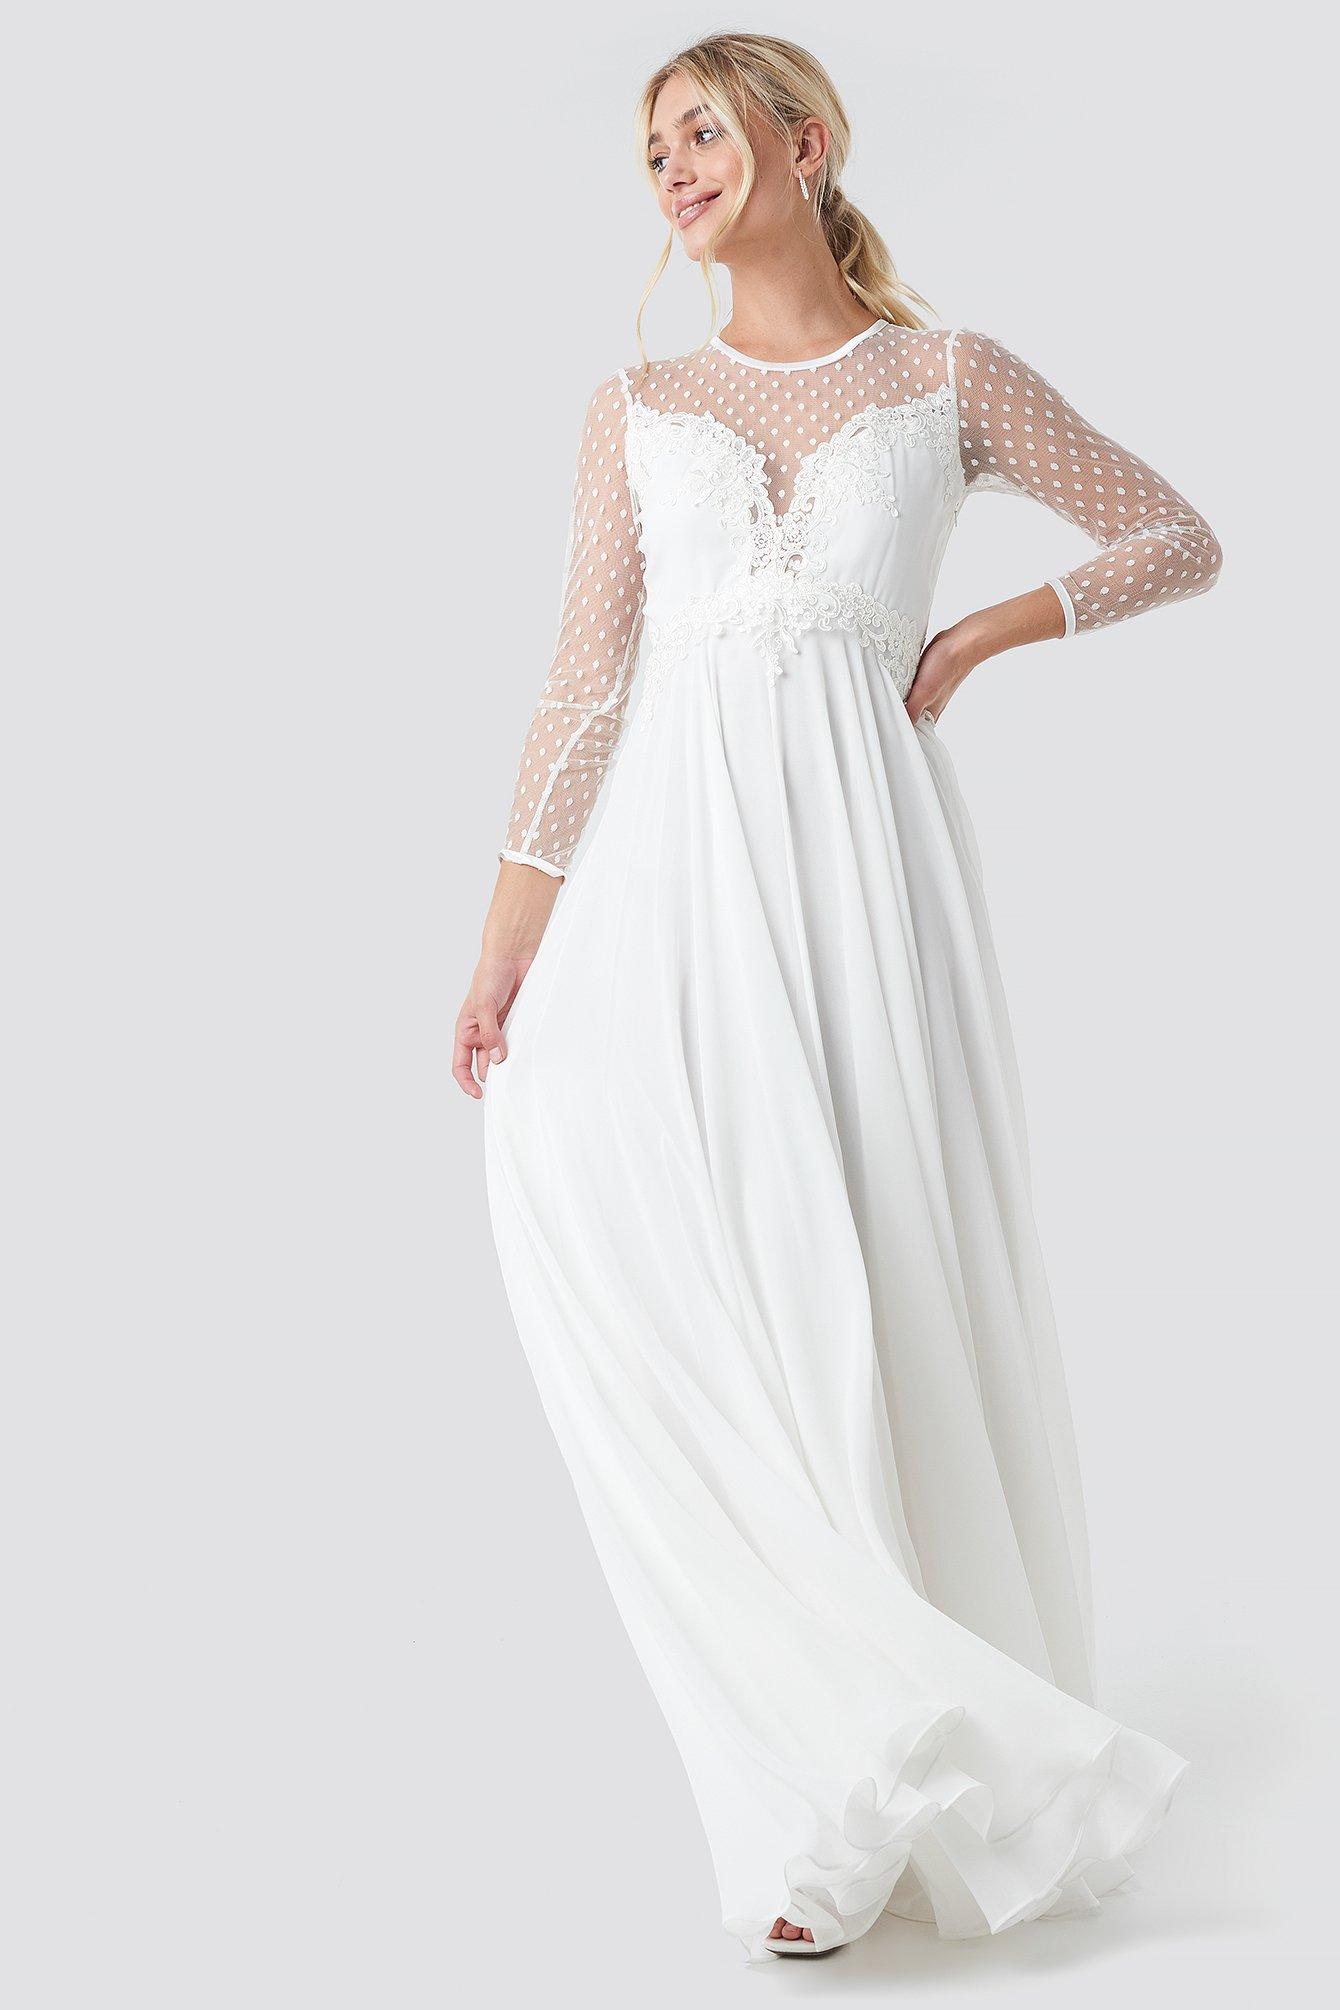 Ida Sjöstedt Alicia Dress - White